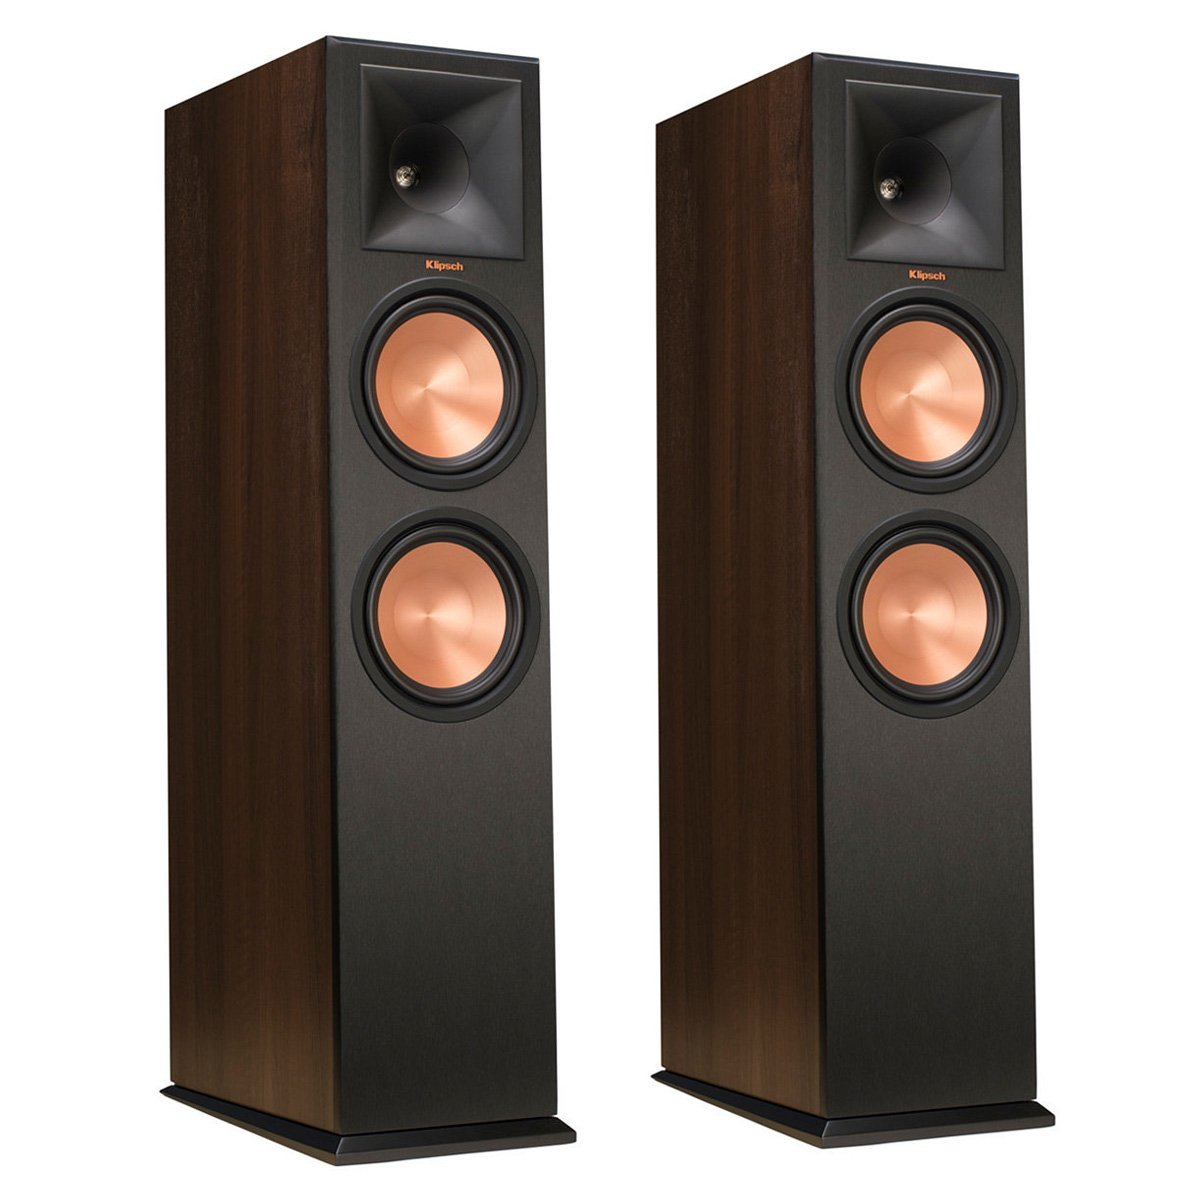 Klipsch RP-280F Walnut Floorstanding Speakers (Pair)